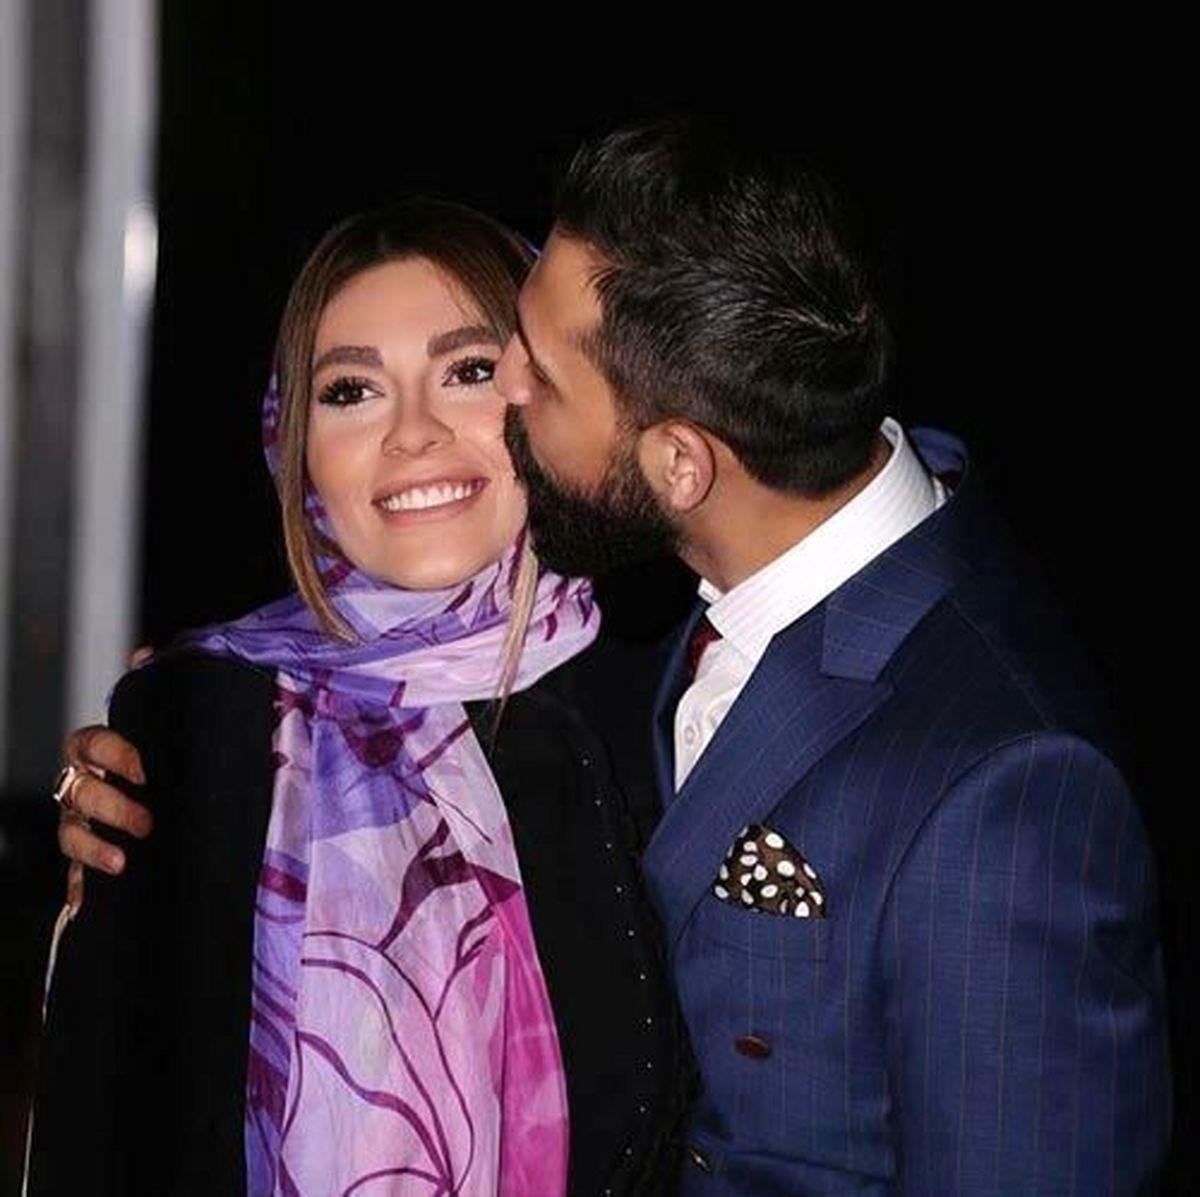 محسن افشانی ازدواج کرد + عکس لورفته